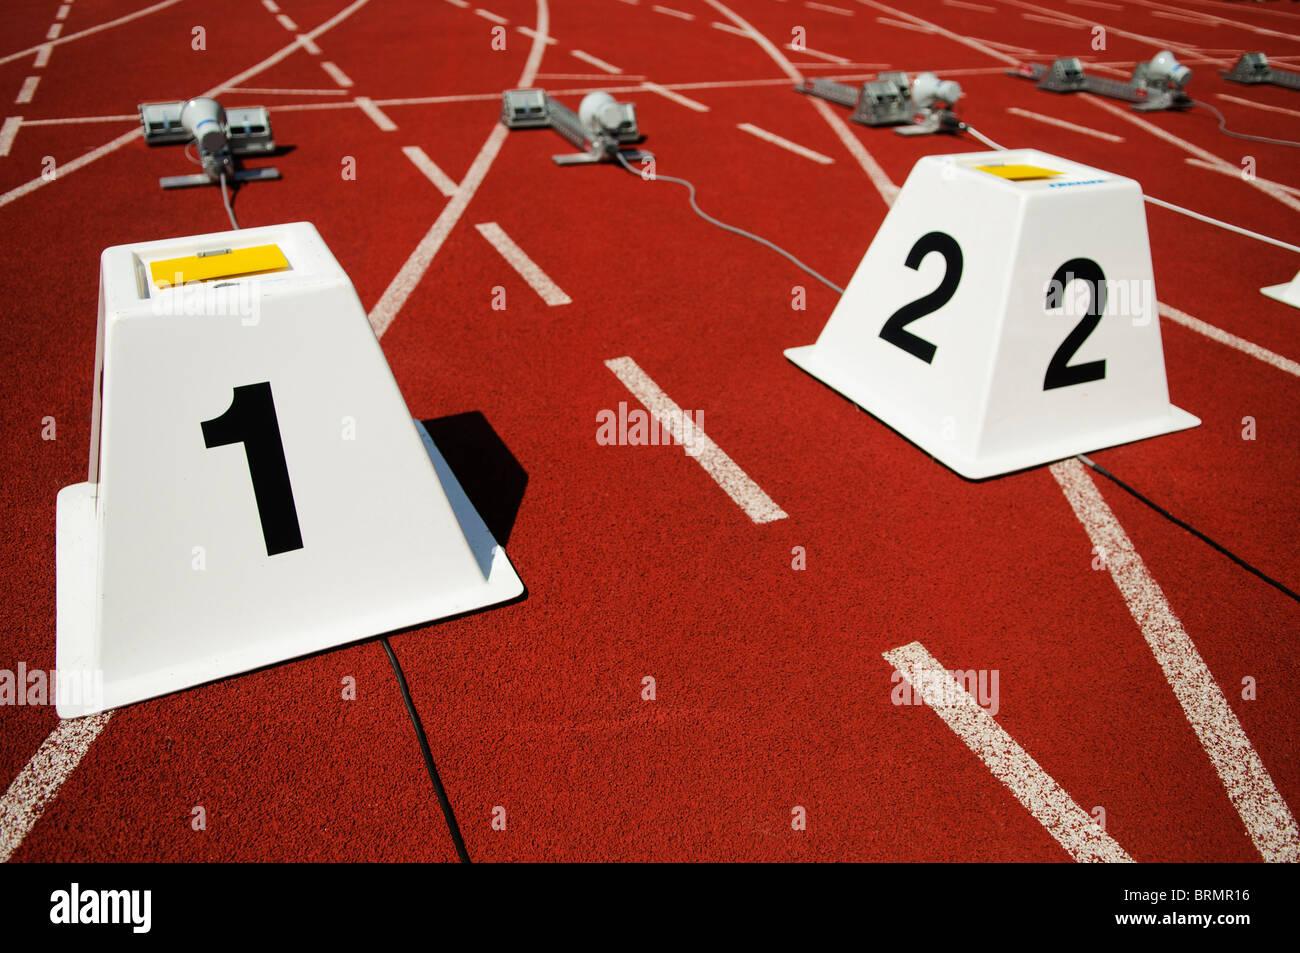 empty starting blocks on running track - Stock Image